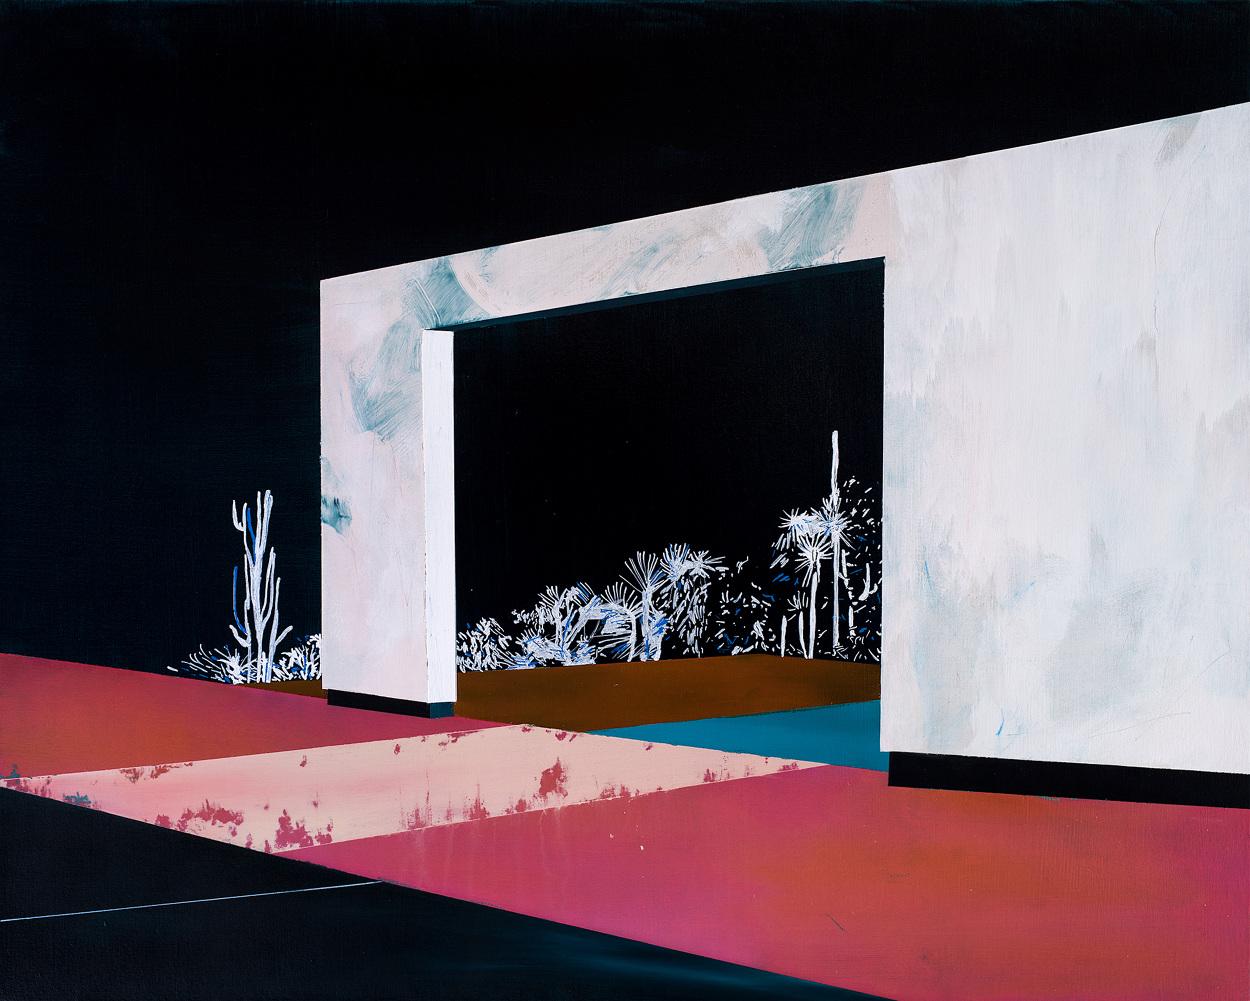 Tropical-Archway--100x80cm--mixed-media-on-canvas--2016_1250.jpg